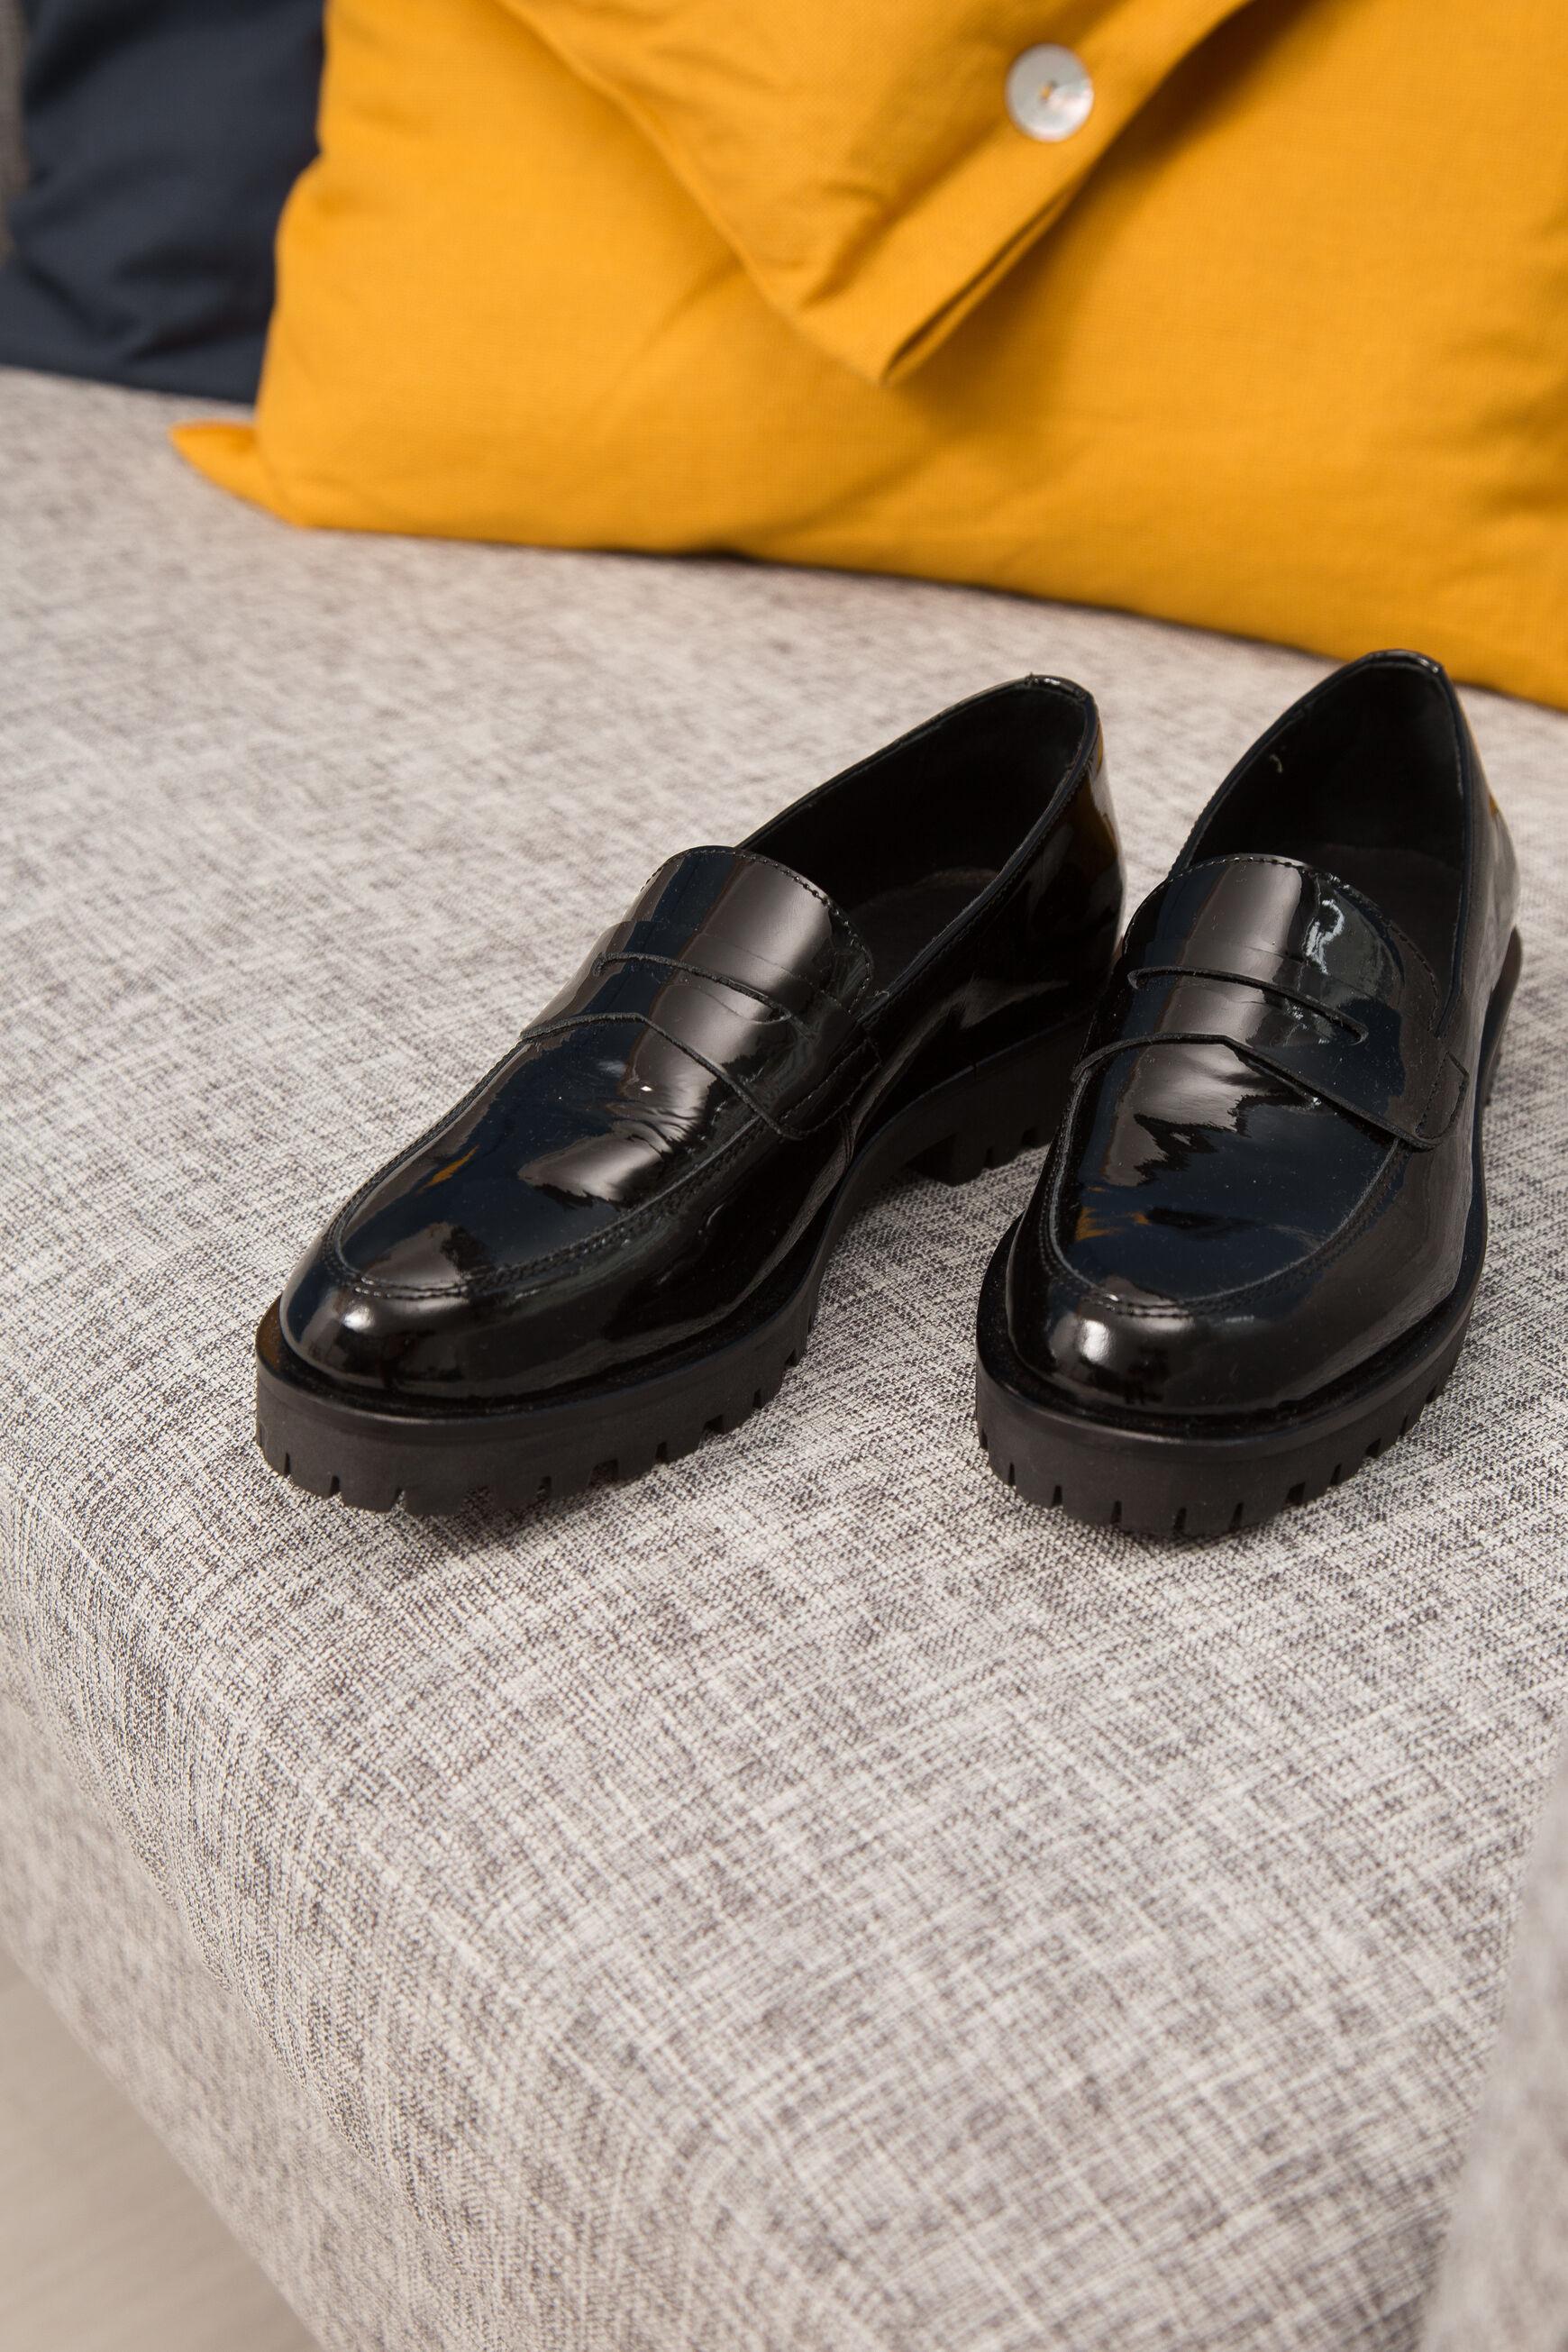 wholesale dealer 729cb 2775b Noël fou saisir saisir saisir grand concours Chaussure mode pour femme  CAROLL   Outlet Store ea5746